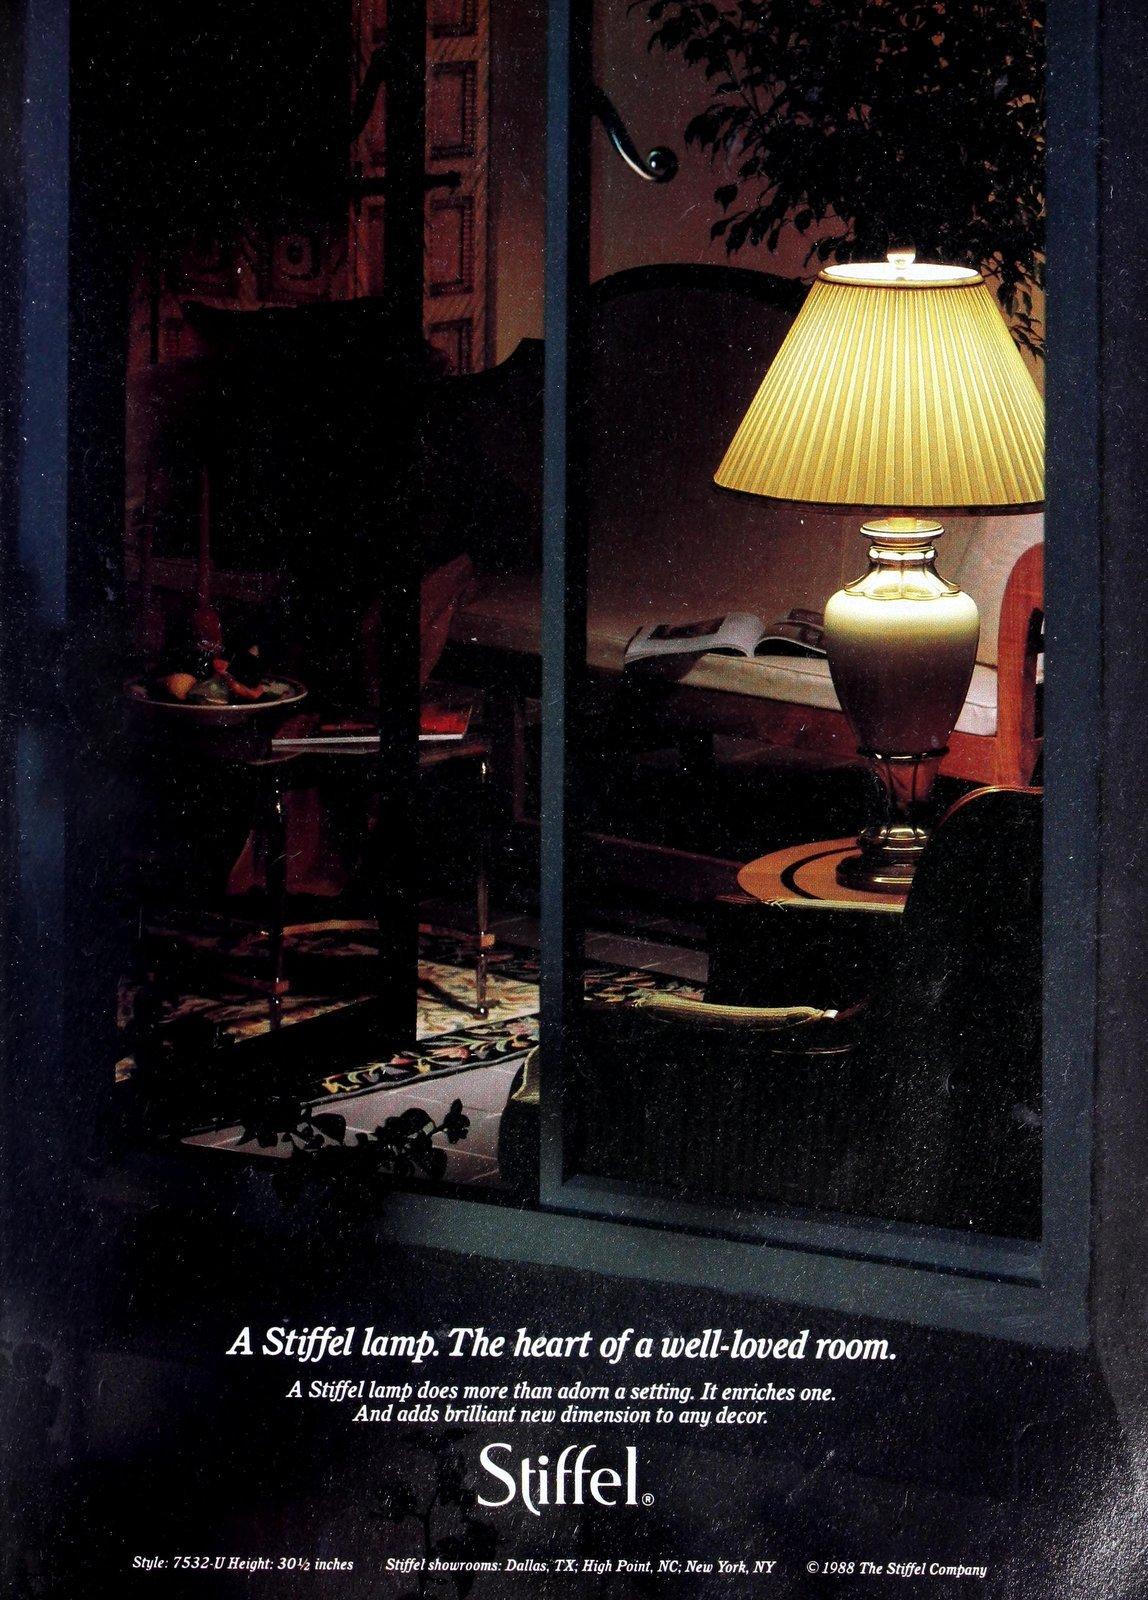 Vintage Stiffel large ceramic table lamp (1989)